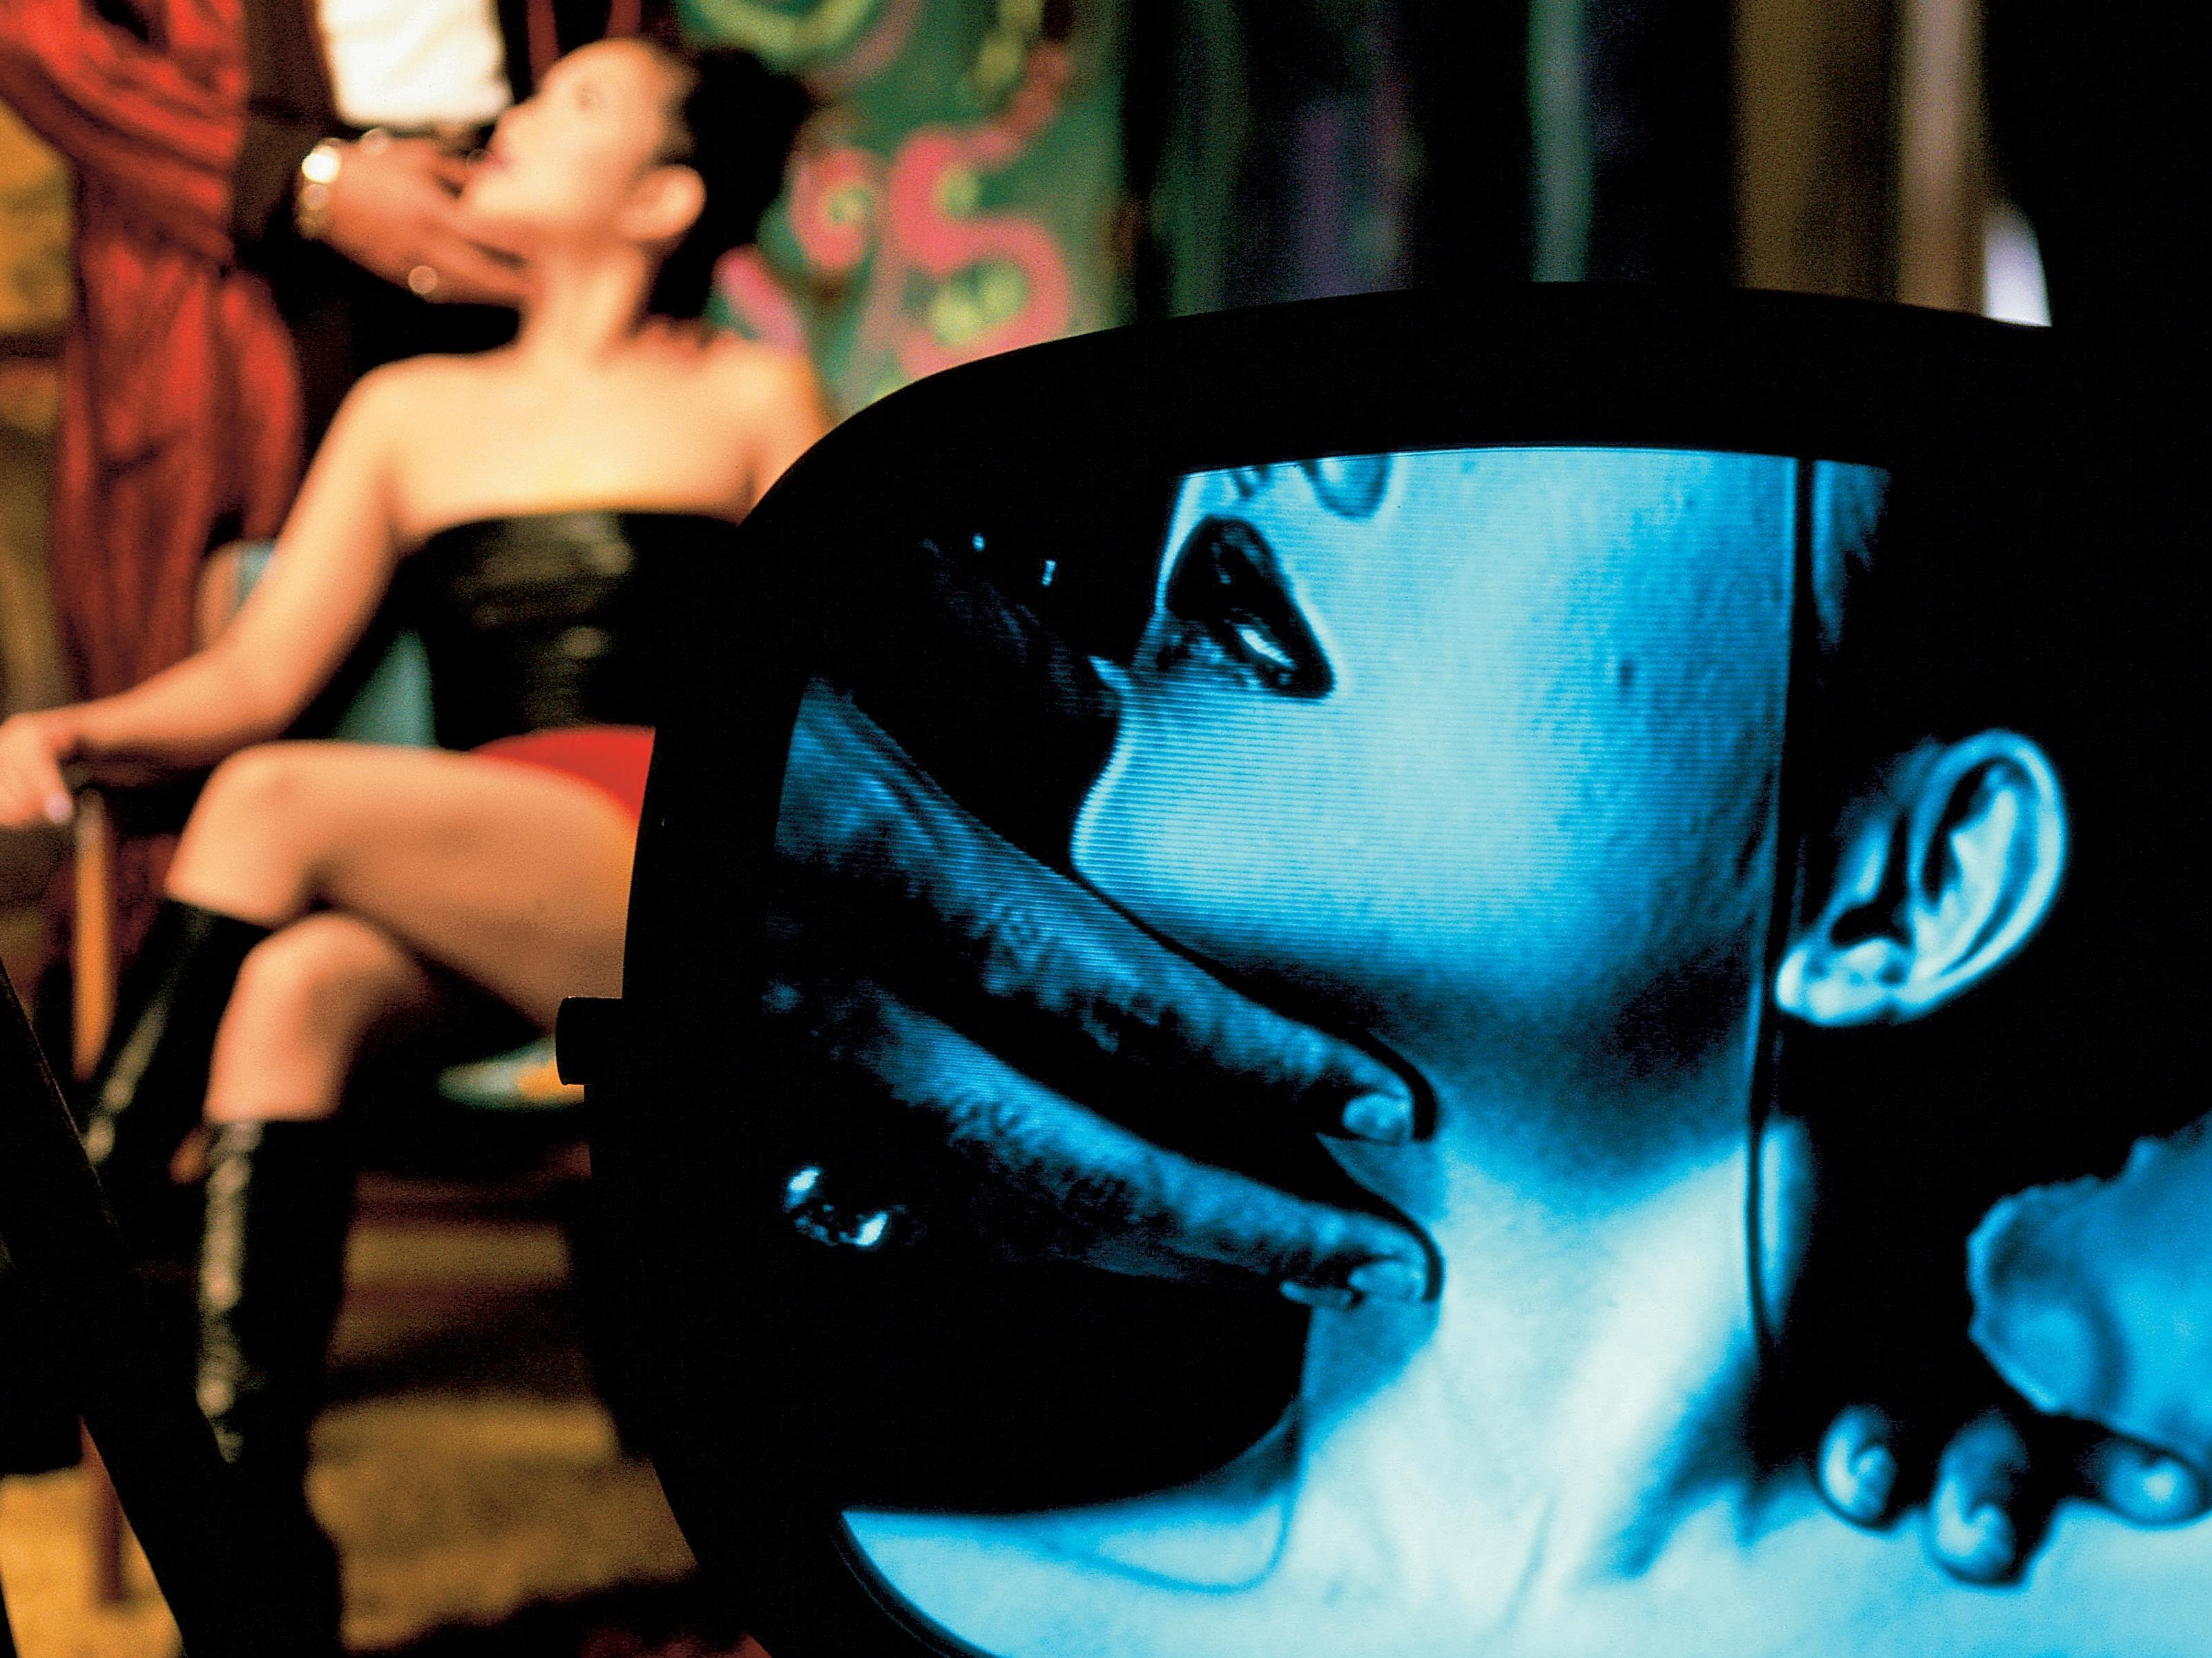 Shank gejowska scena seksu